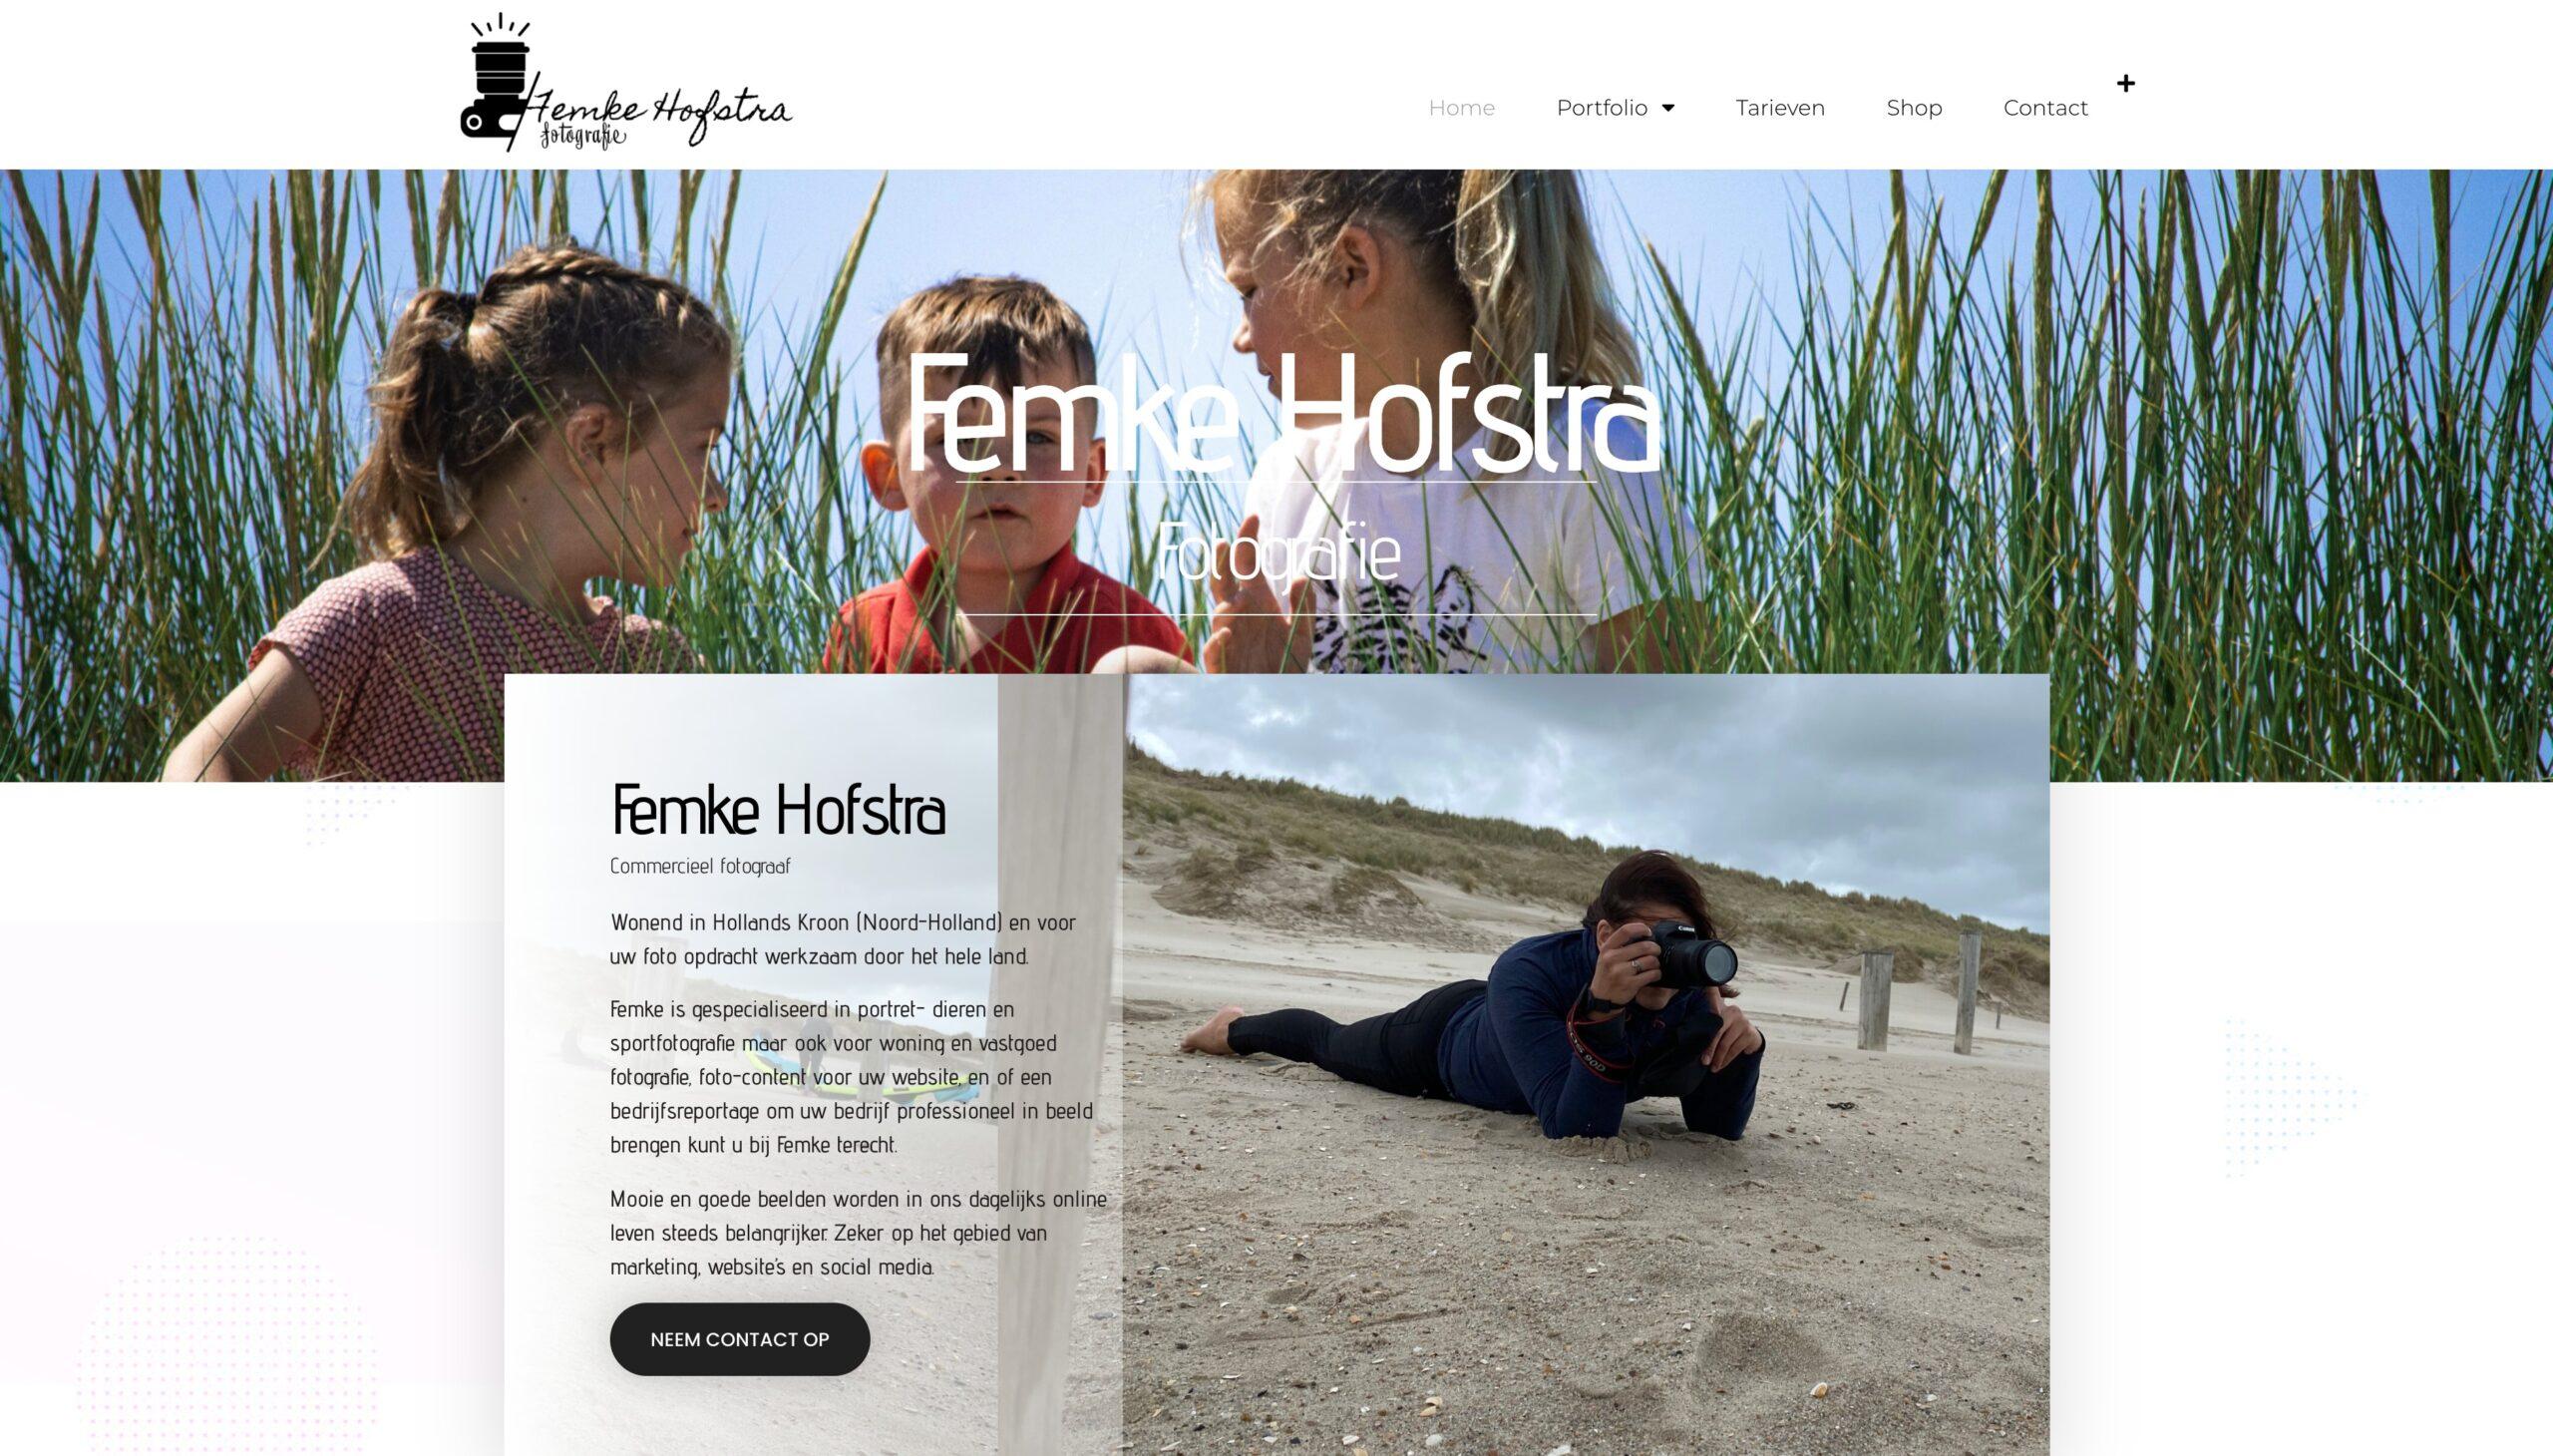 Femke Hofstra X www.femkehofstra.nl